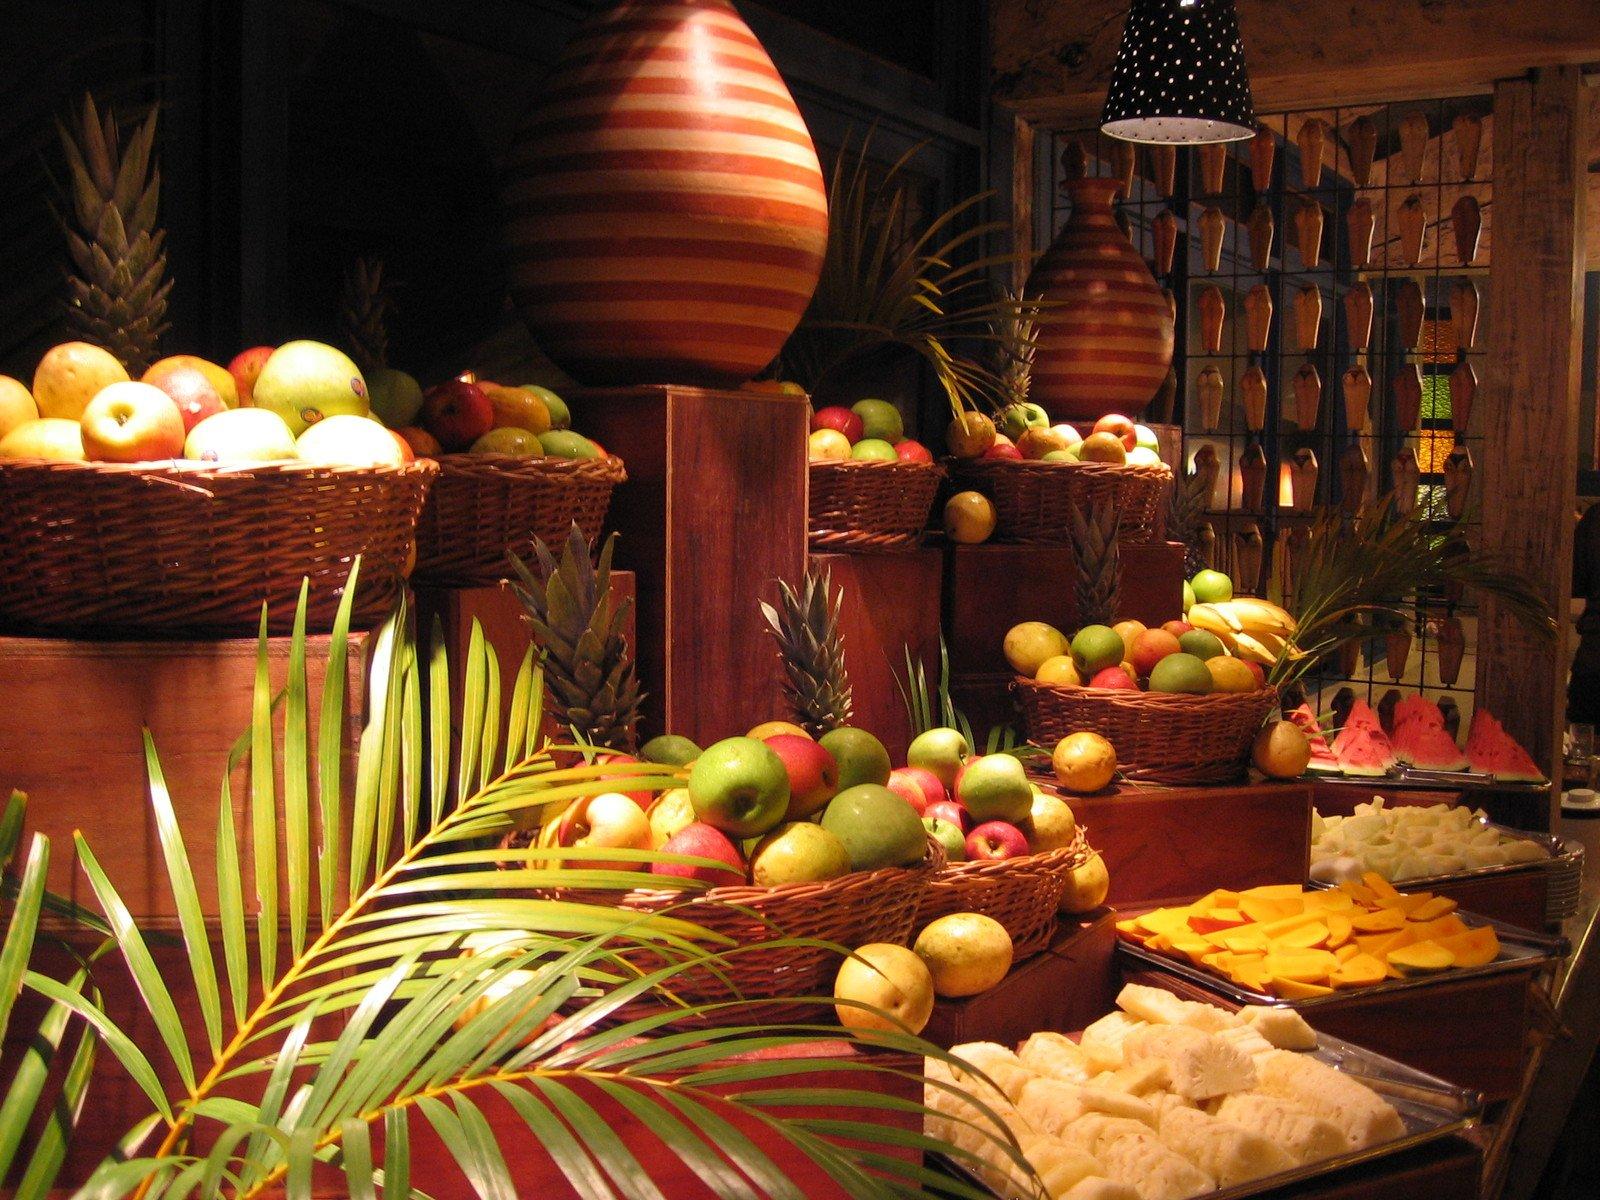 free 果物 stock photo freeimages com